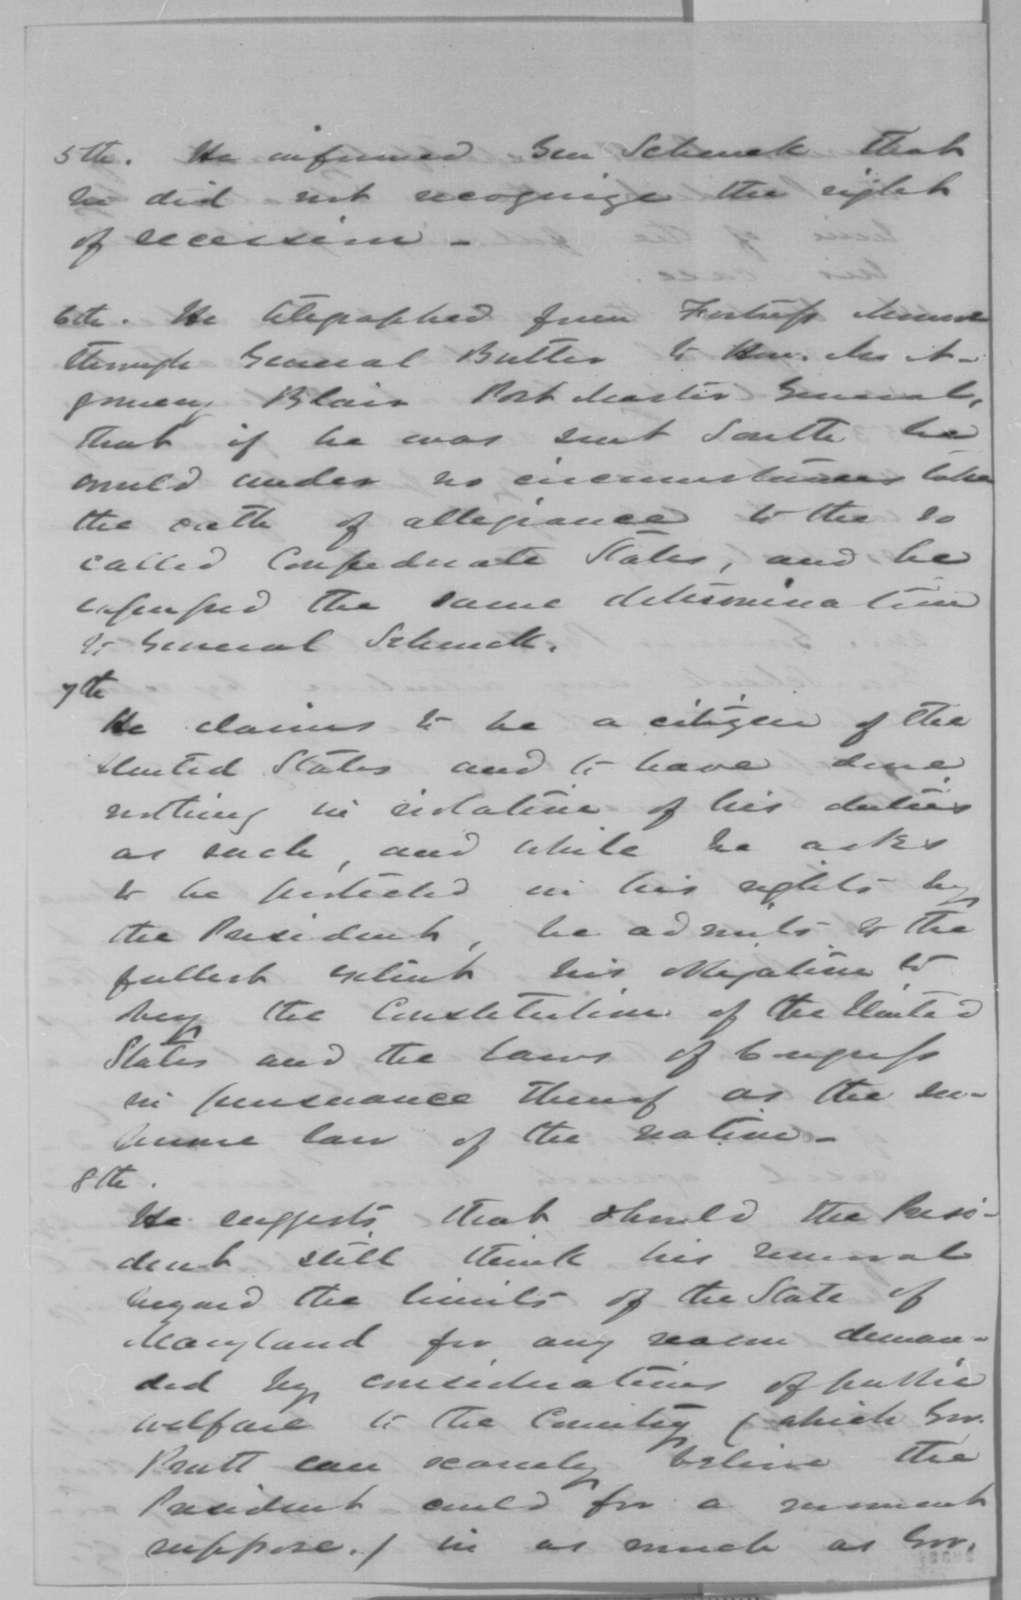 Daniel Clark, December 1863  (Notes on case of Thomas G. Pratt)